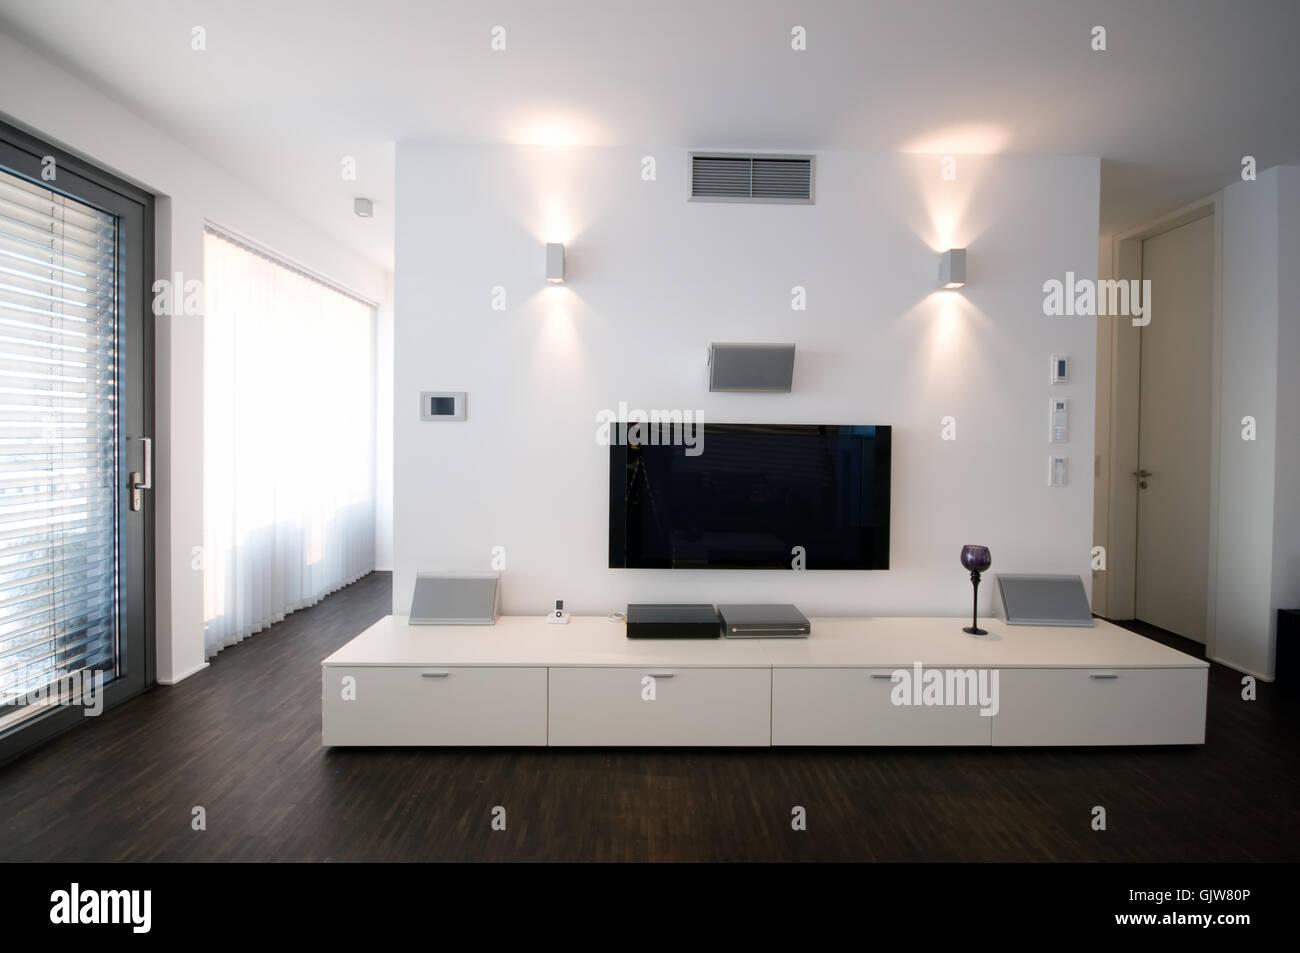 Home Cinema Stock Photos & Home Cinema Stock Images - Alamy